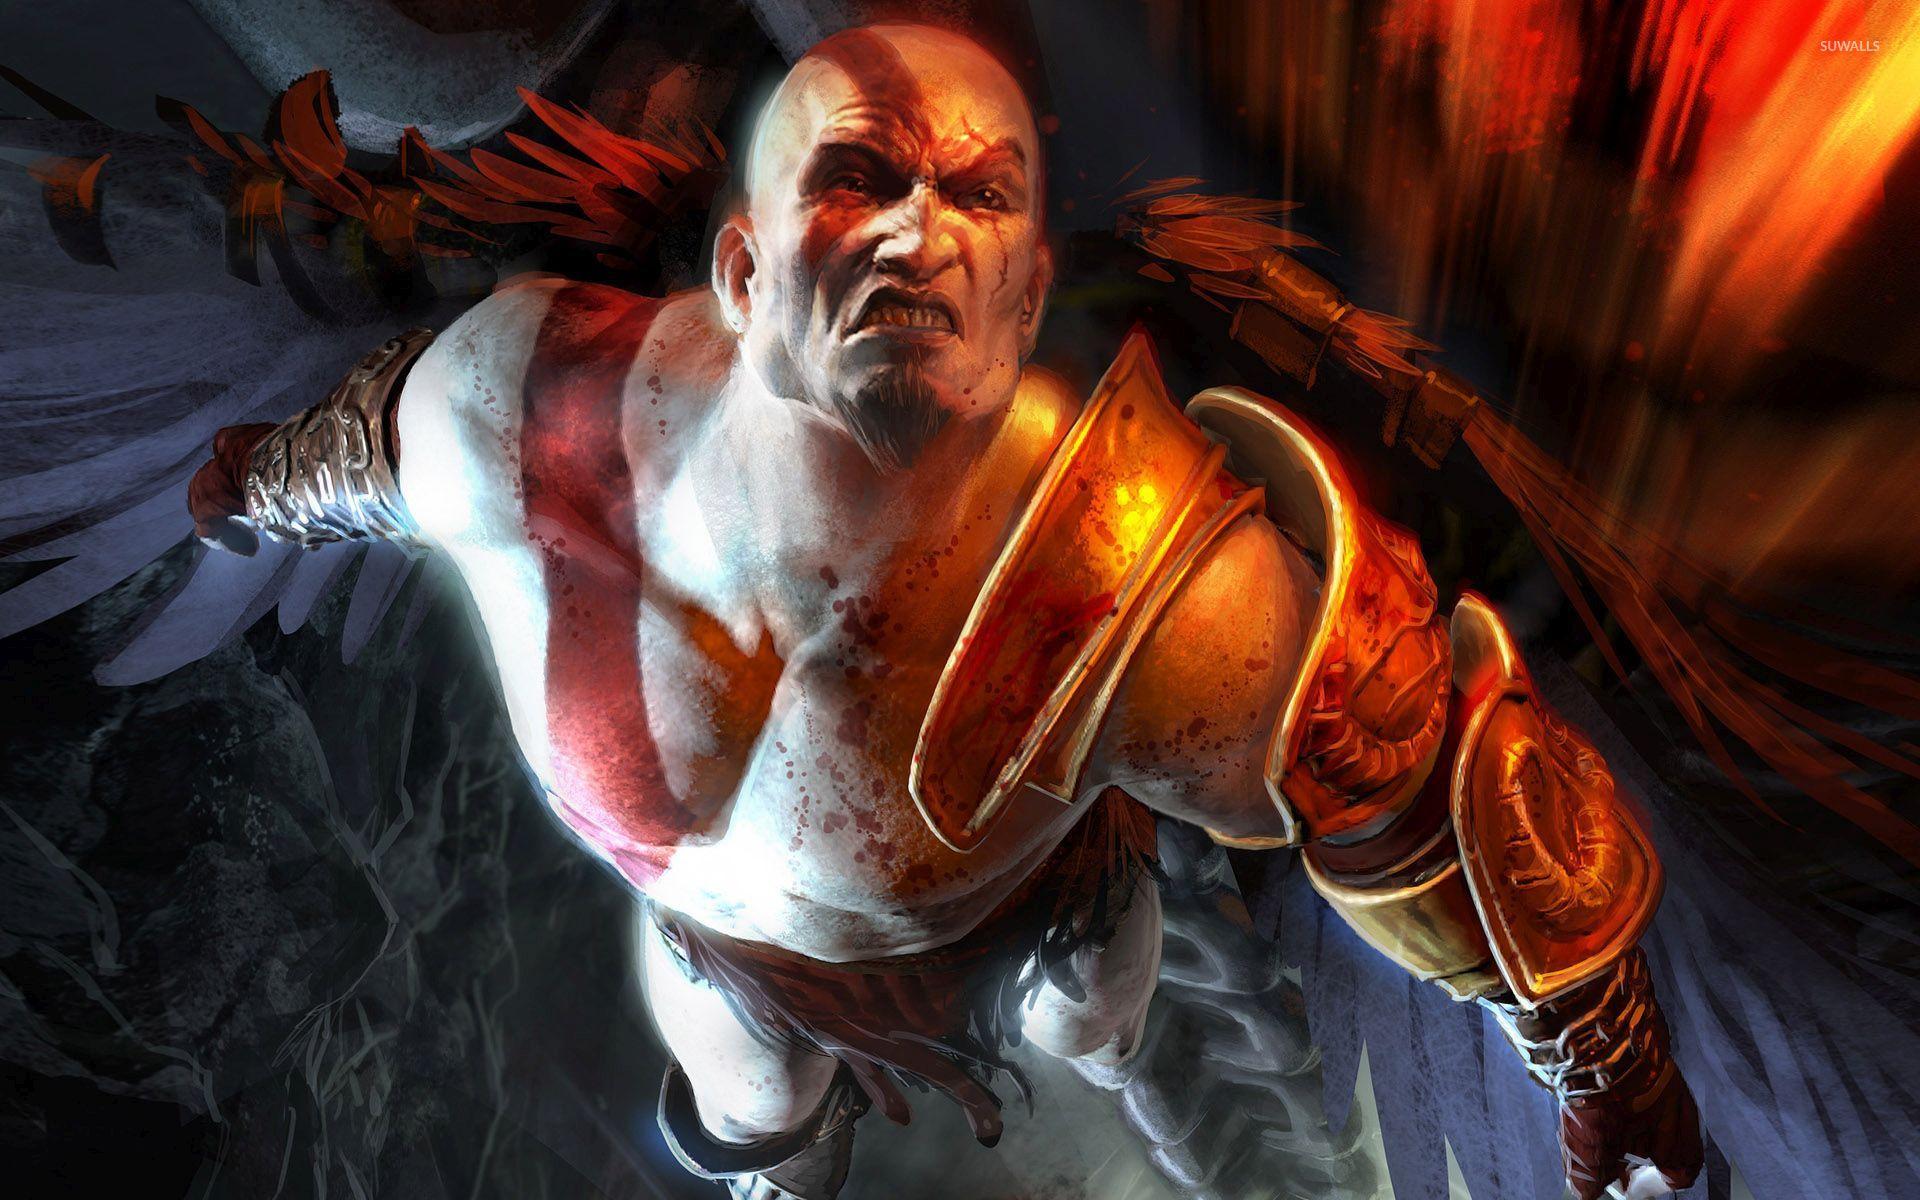 Flying Kratos In God Of War Wallpaper Game Wallpapers 54495